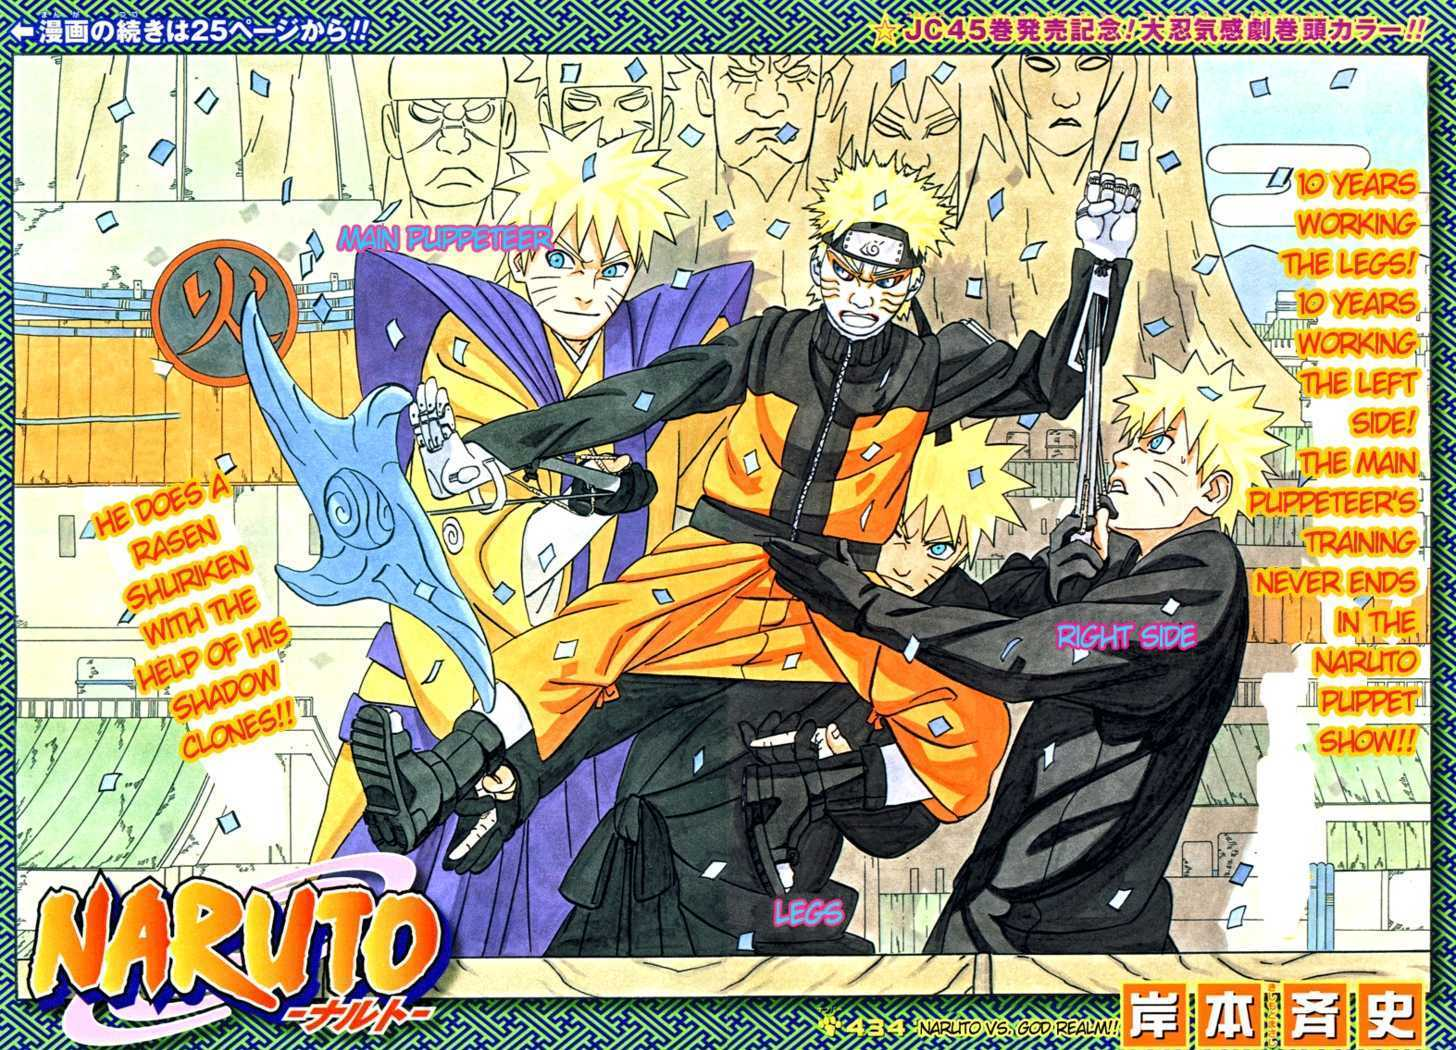 https://im.nineanime.com/comics/pic9/33/289/22835/Naruto4340179.jpg Page 1